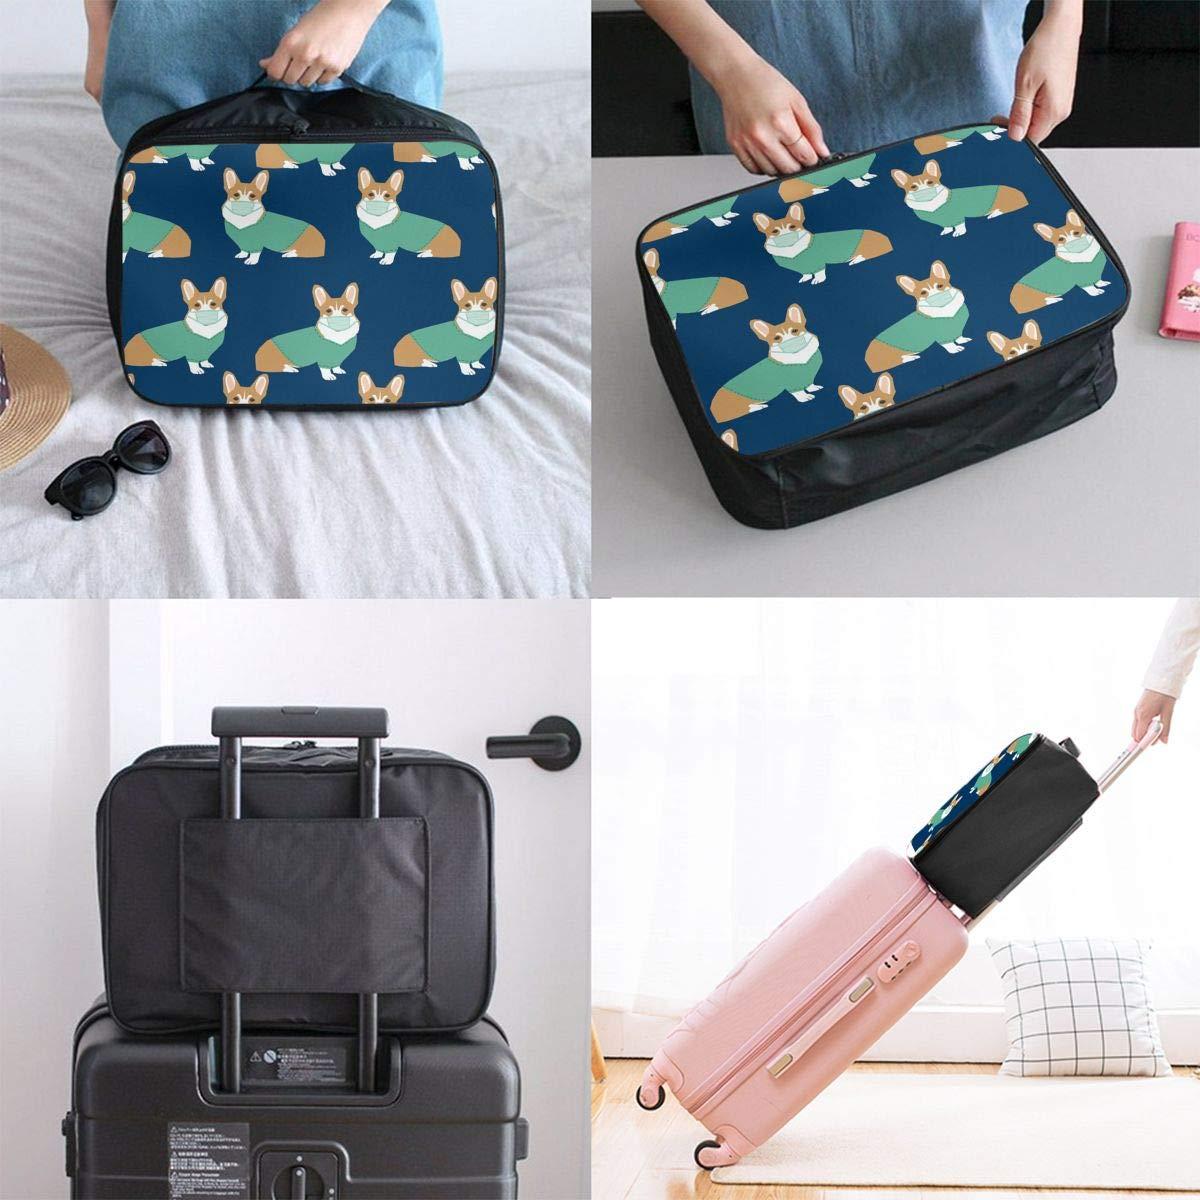 Travel Duffel Bag Waterproof Fashion Lightweight Large Capacity Portable Luggage Bag Corgi In Scrubs